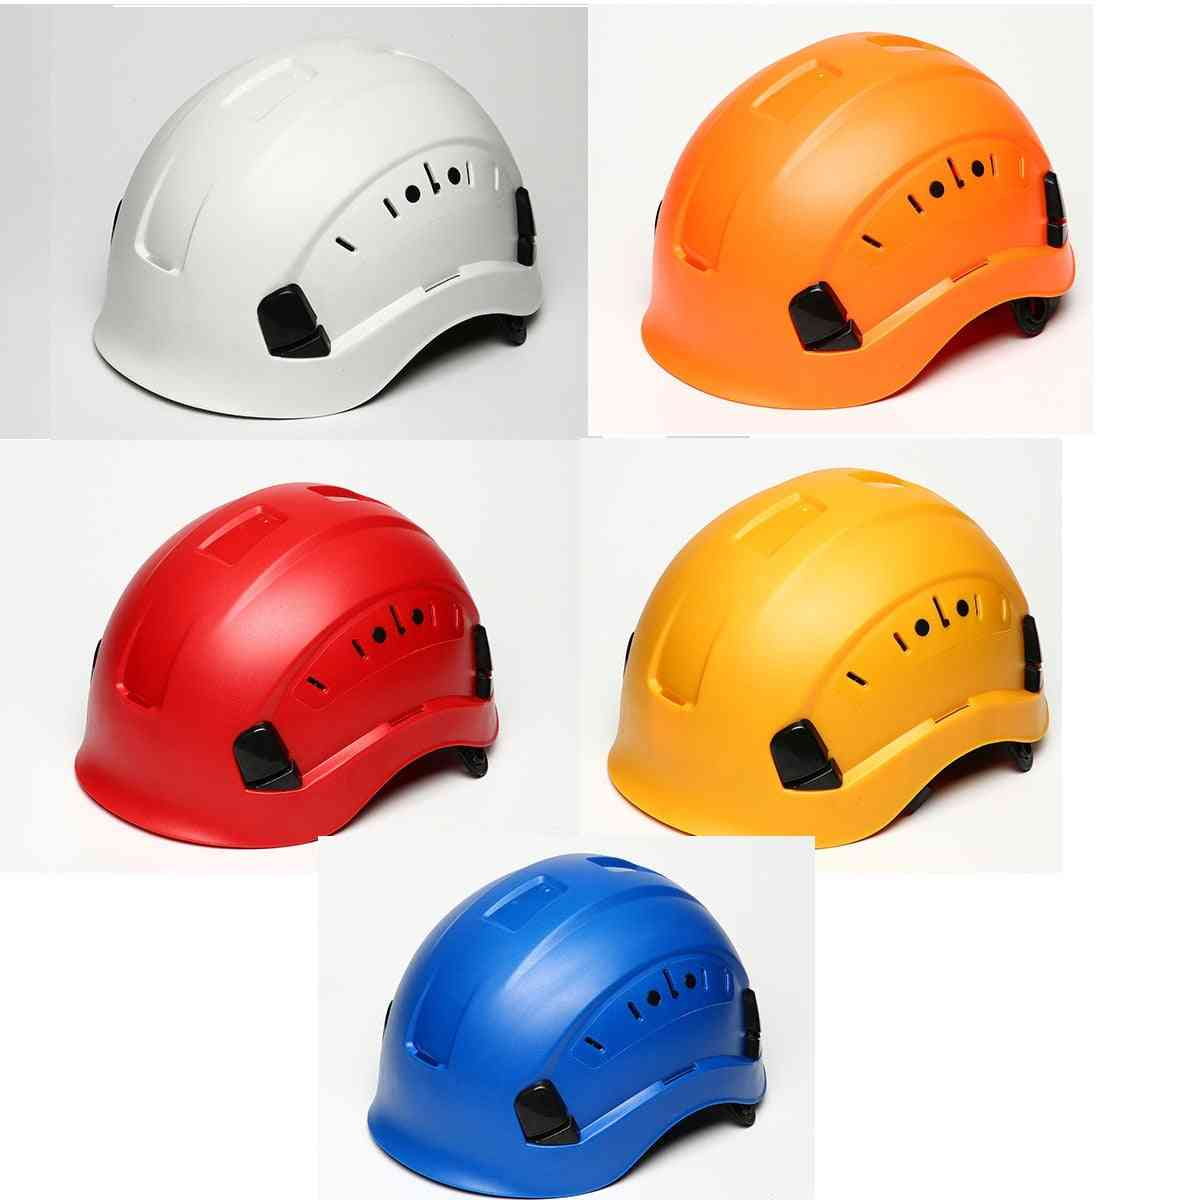 Safety Helmet Construction, Climbing, Steeplejack  Protective, Hard Hat